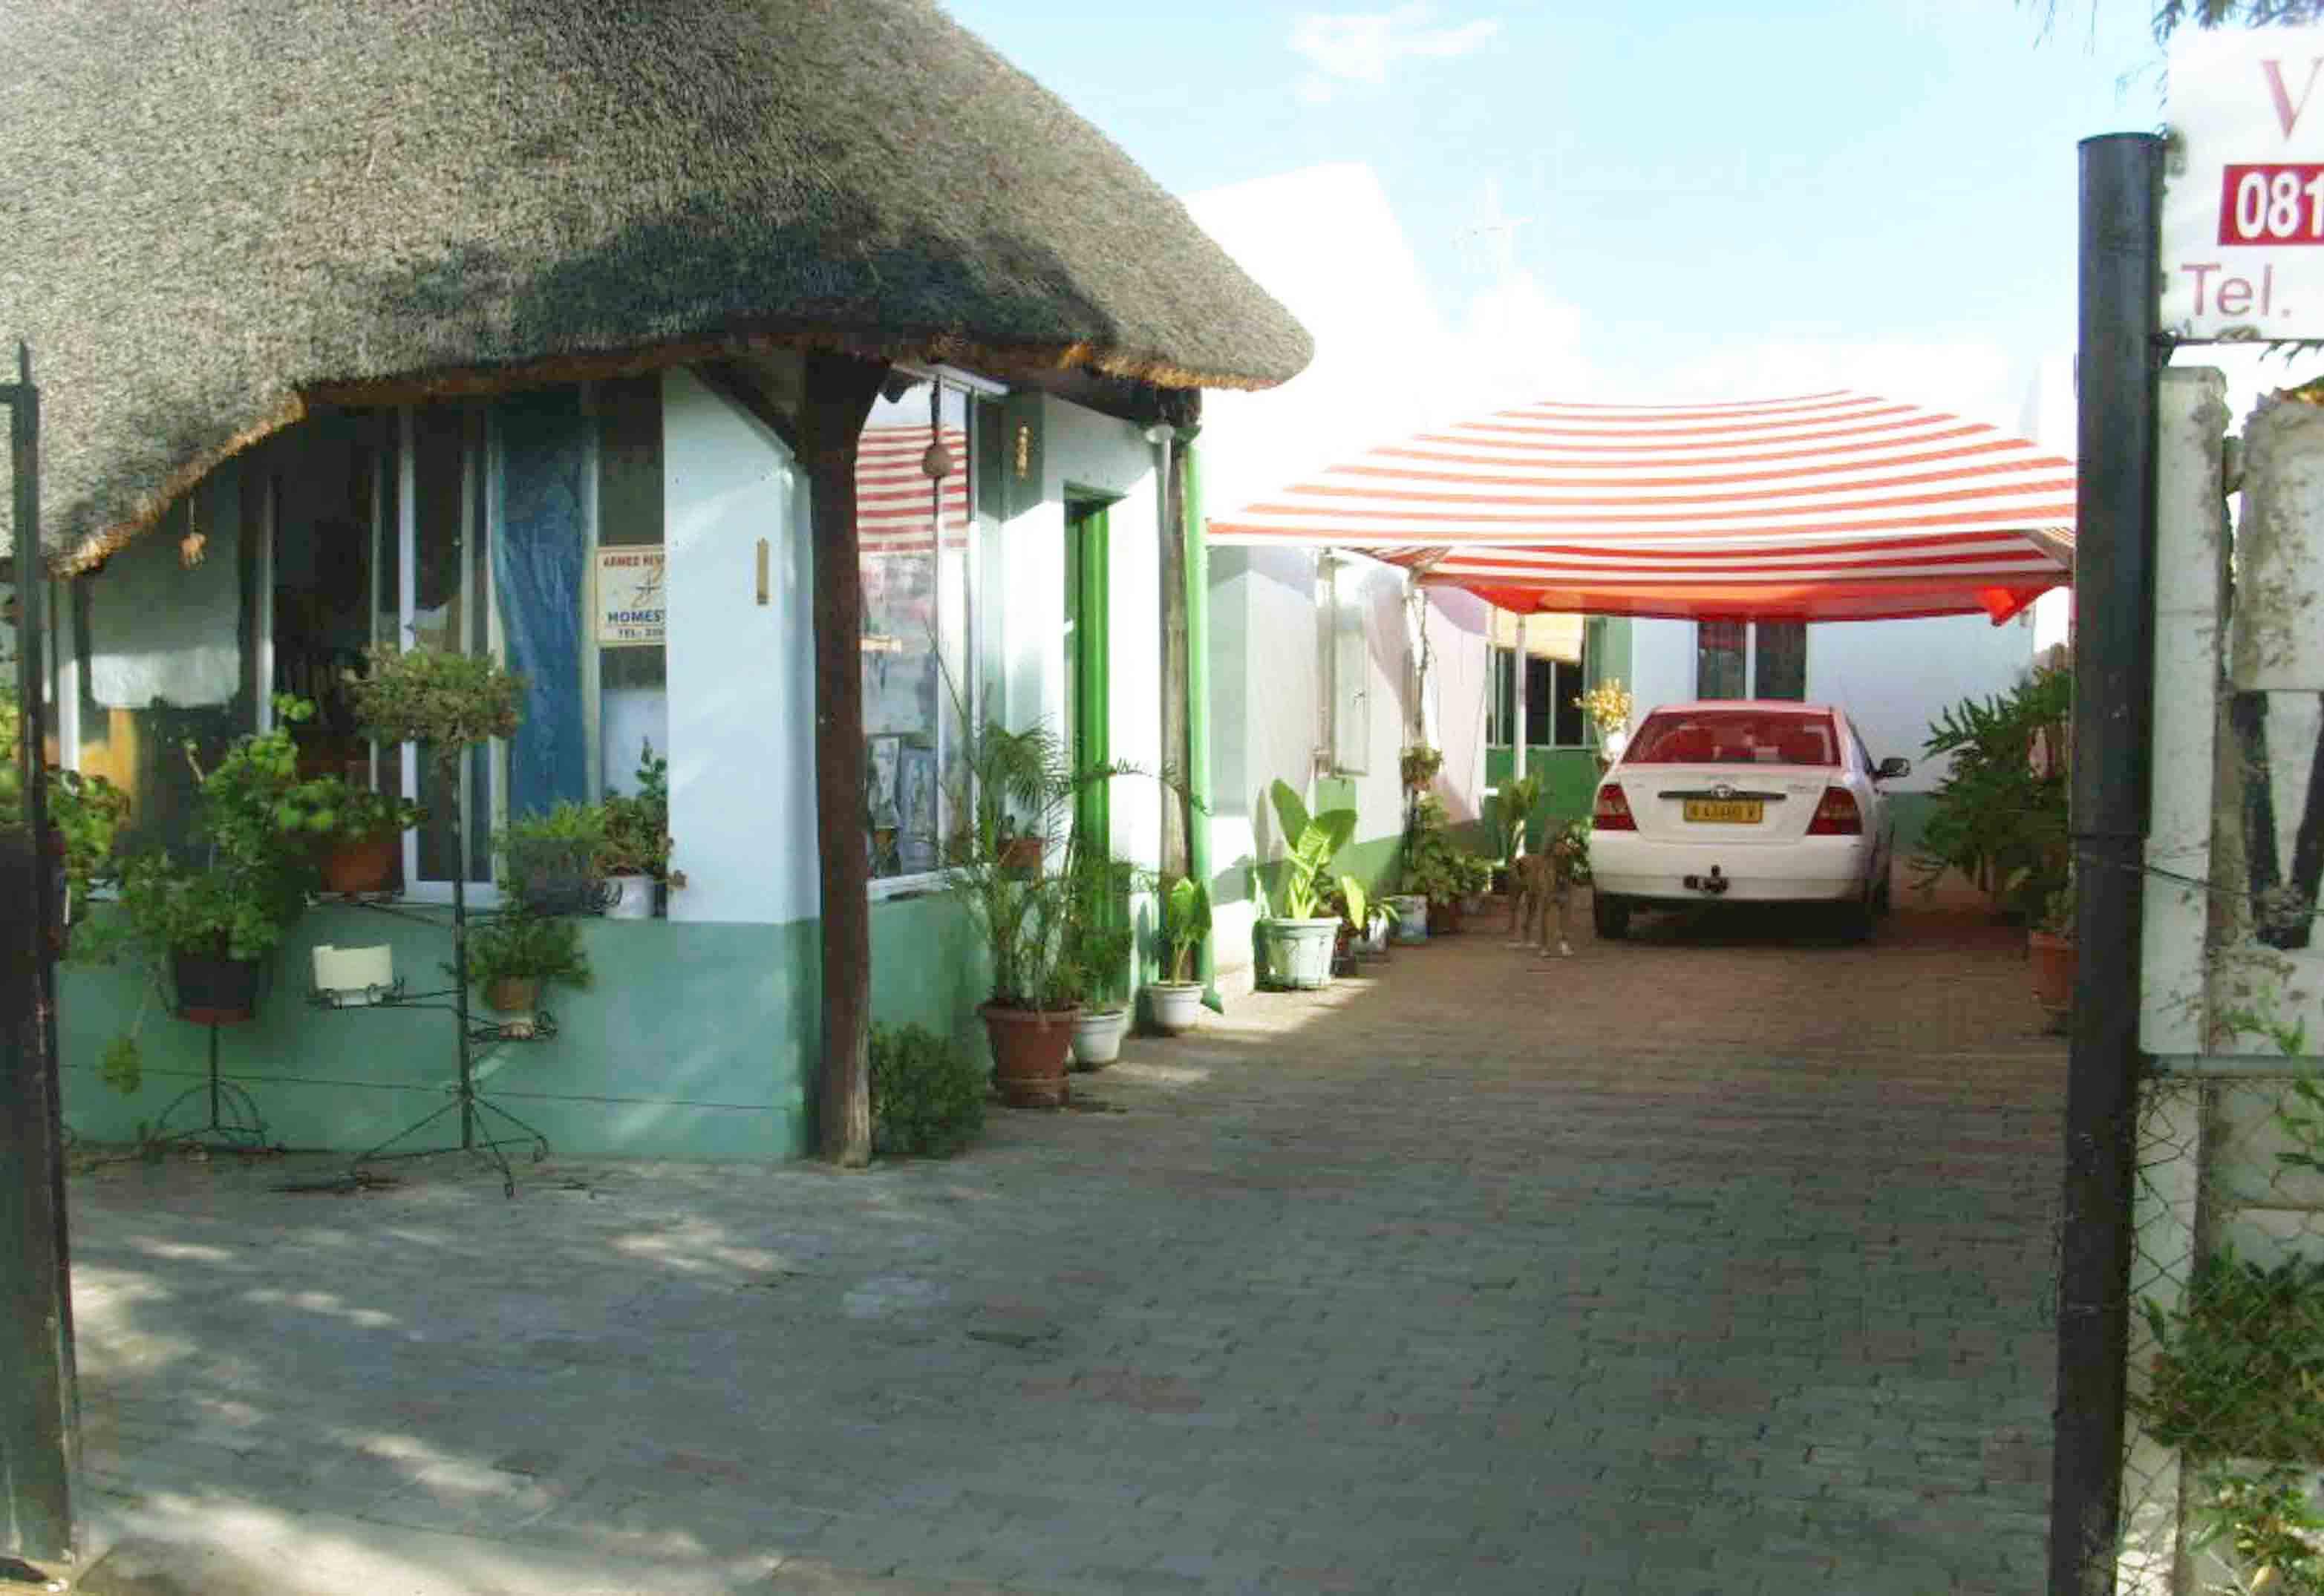 Vees accommodation Windhoek